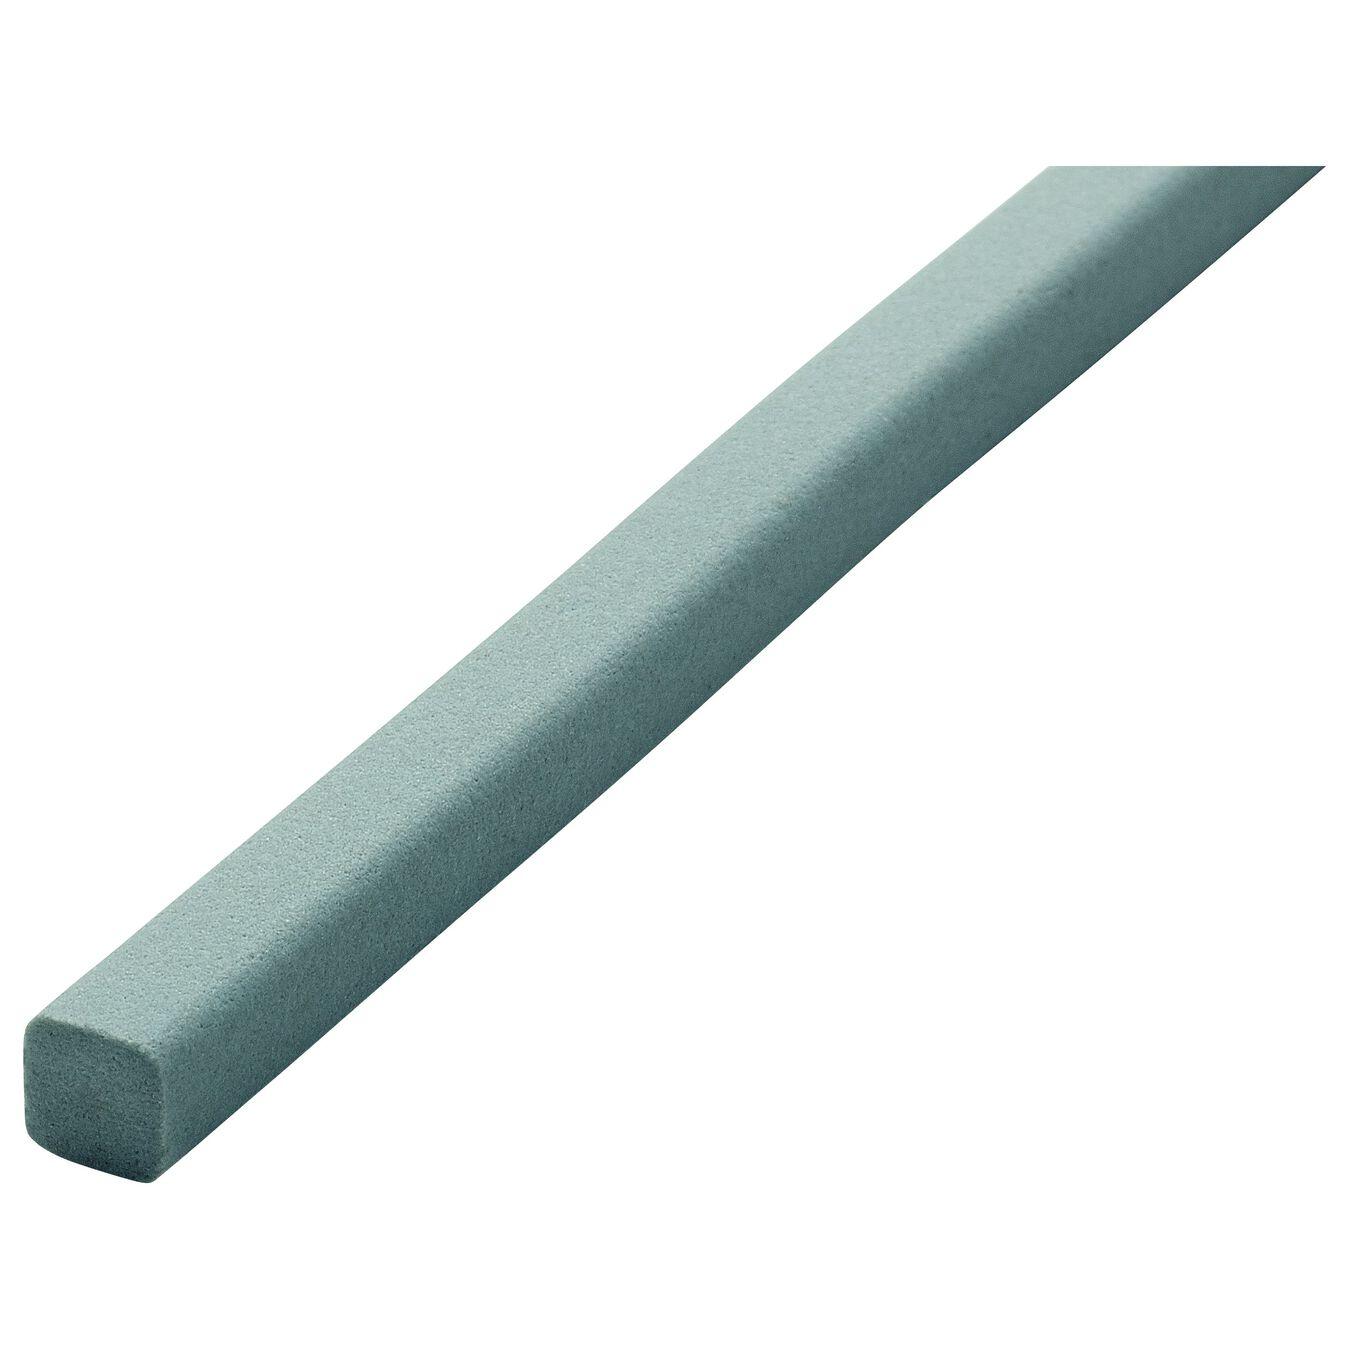 Sharpening rod, 2 cm | green | ceramic,,large 2